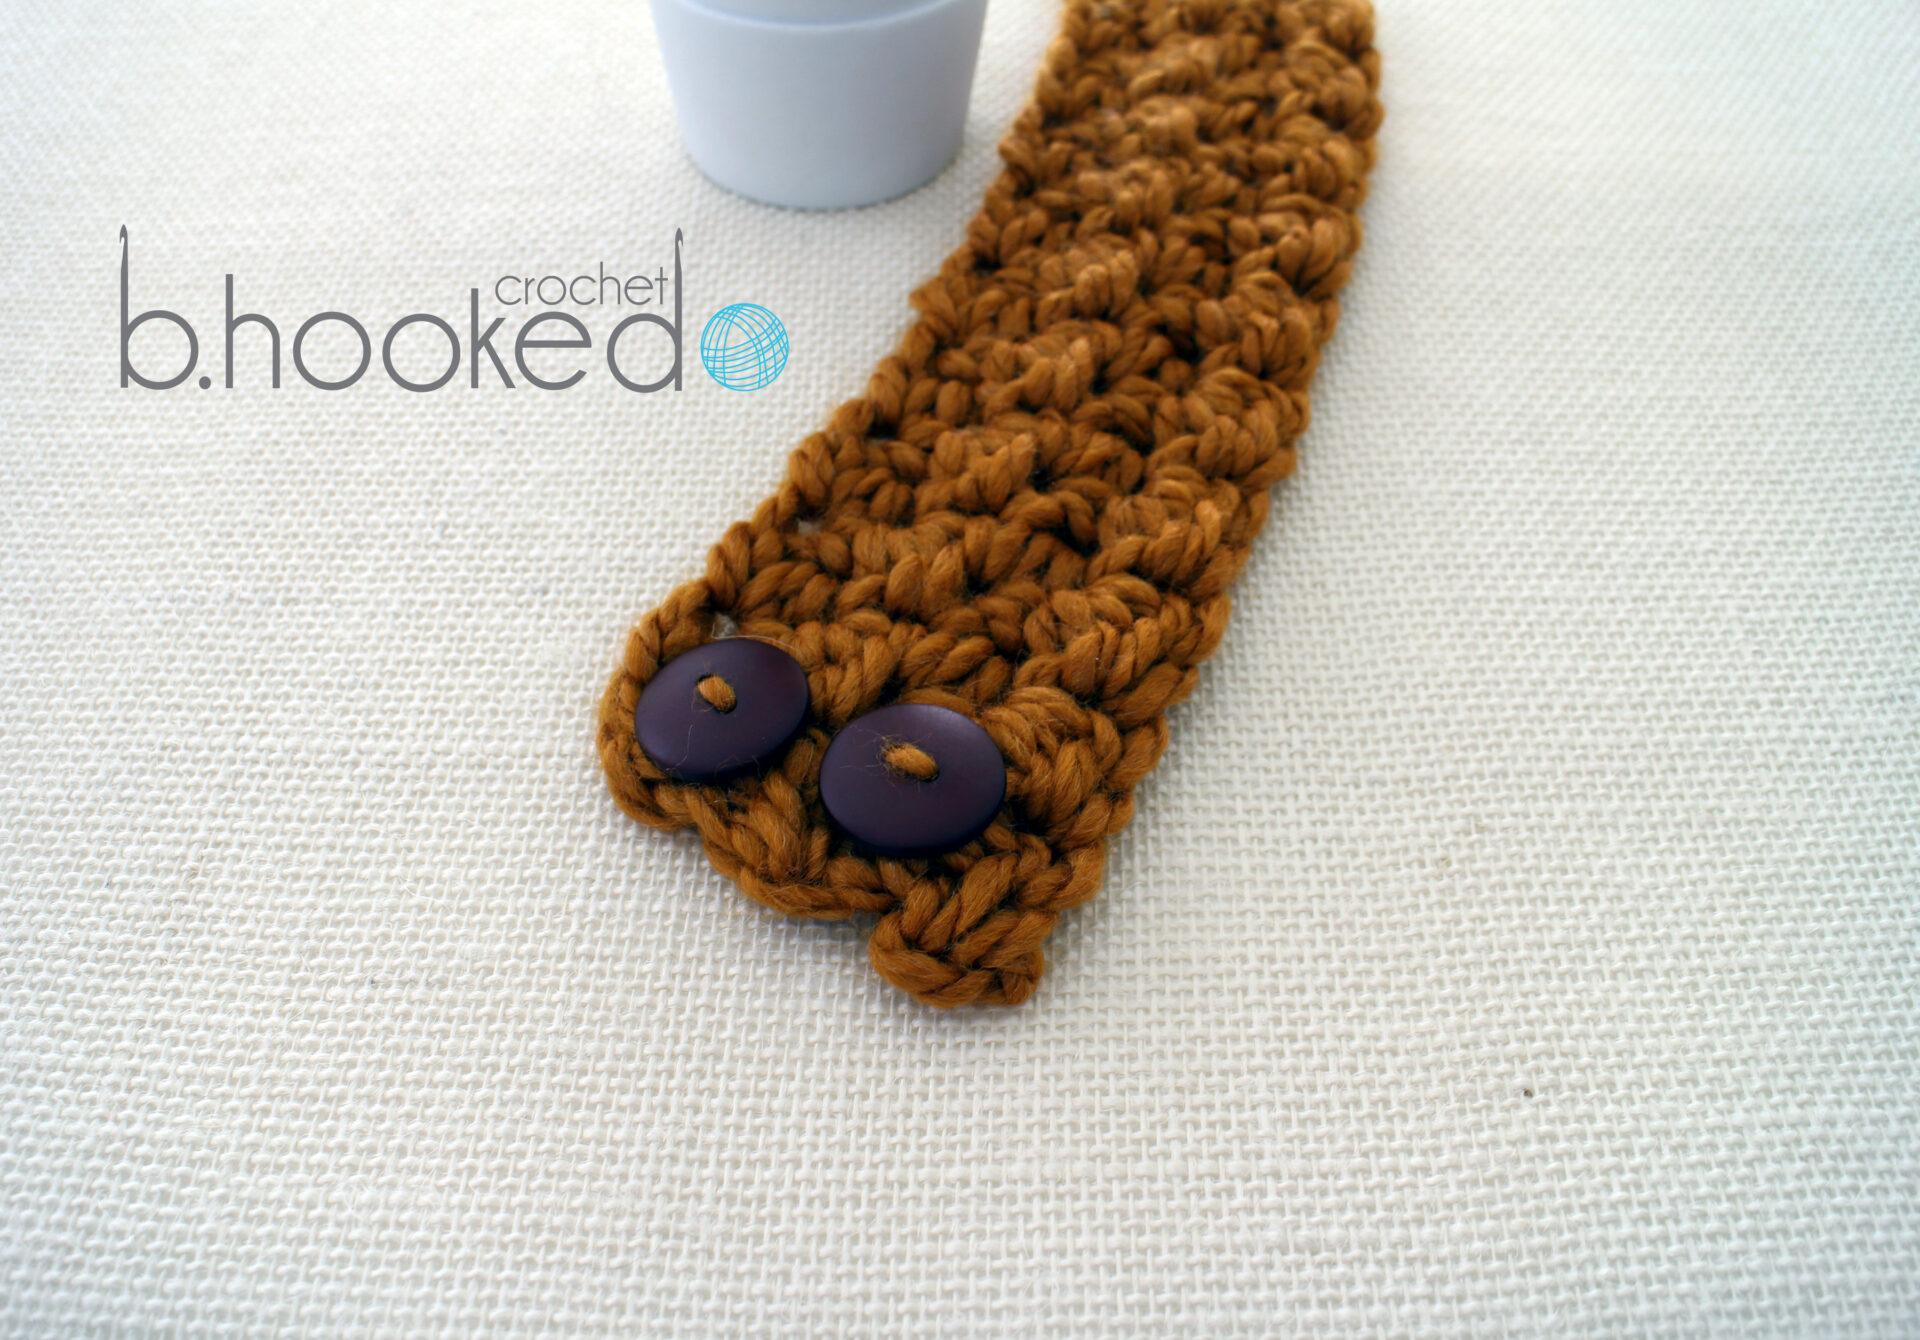 Crochet Pattern by B. Hooked Crochet, Copyright 2013.